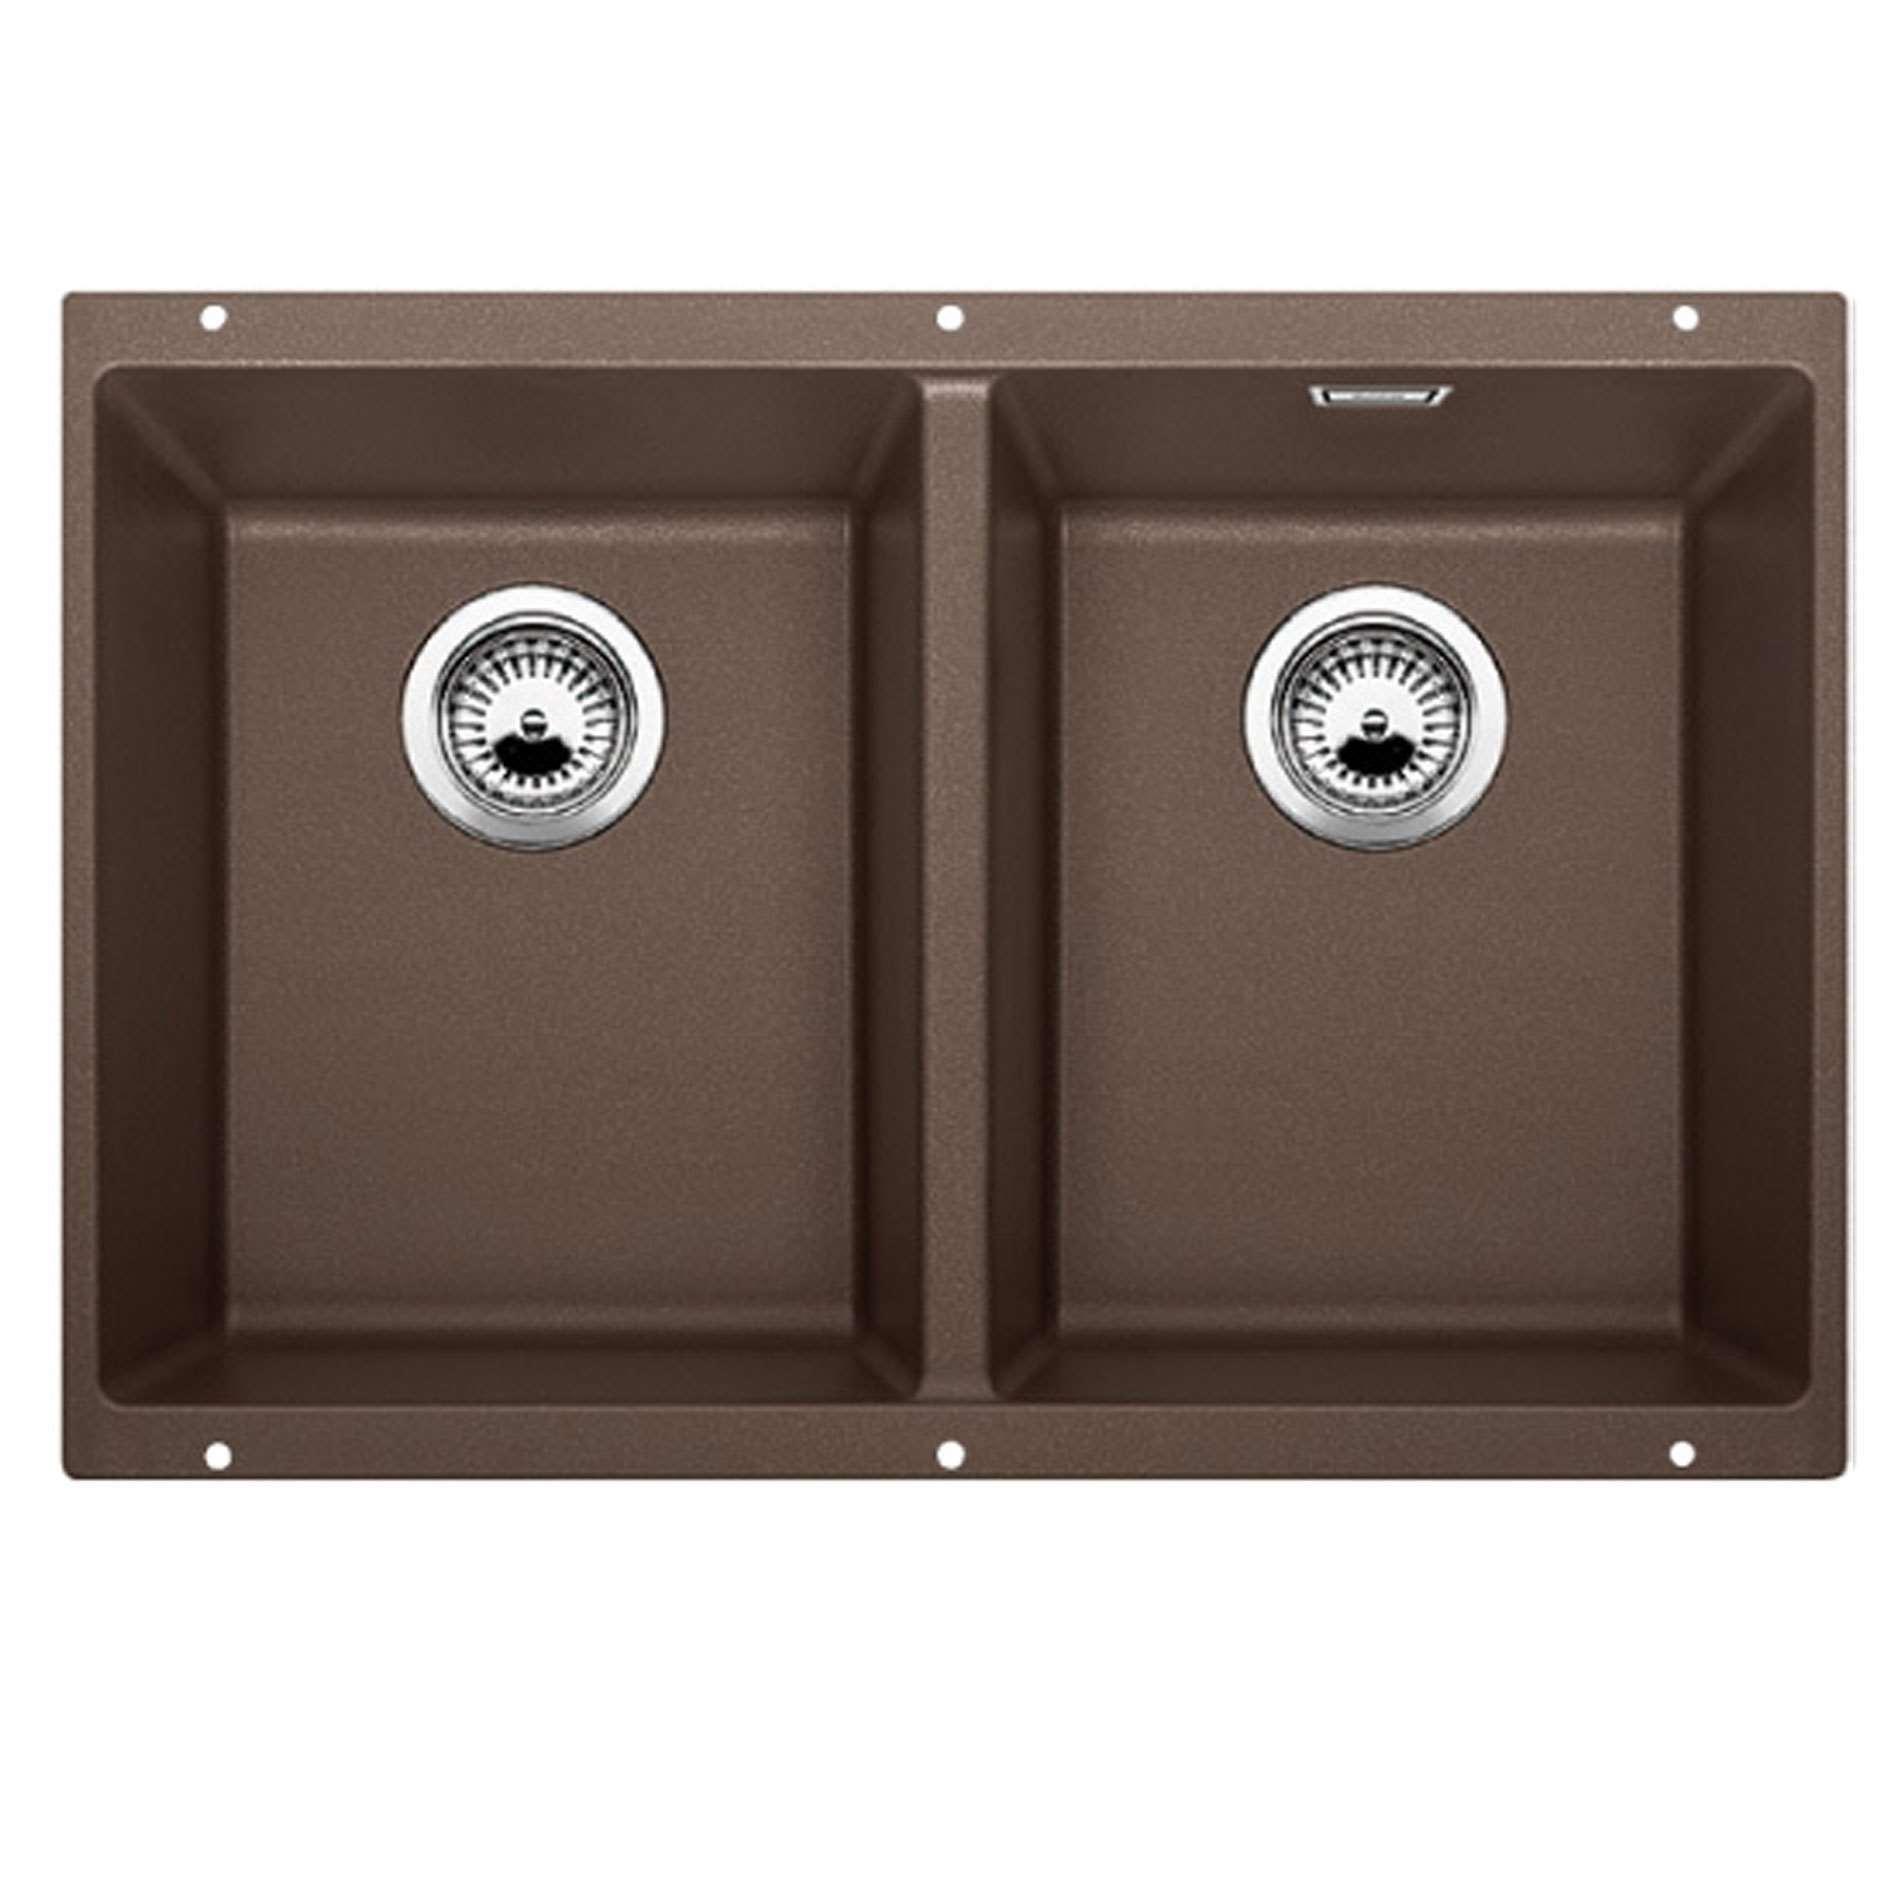 blanco subline 350 350 u coffee silgranit sink kitchen sinks taps. Black Bedroom Furniture Sets. Home Design Ideas